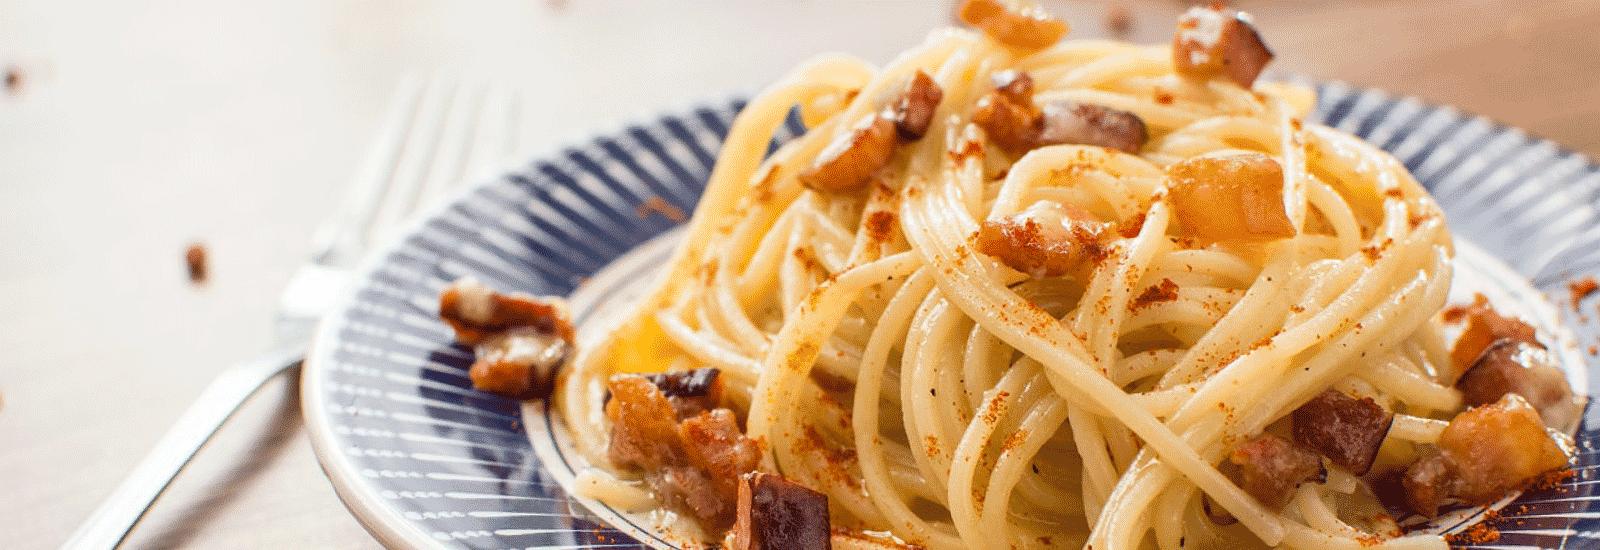 Italian Cuisine Near Naval Station Great Lakes